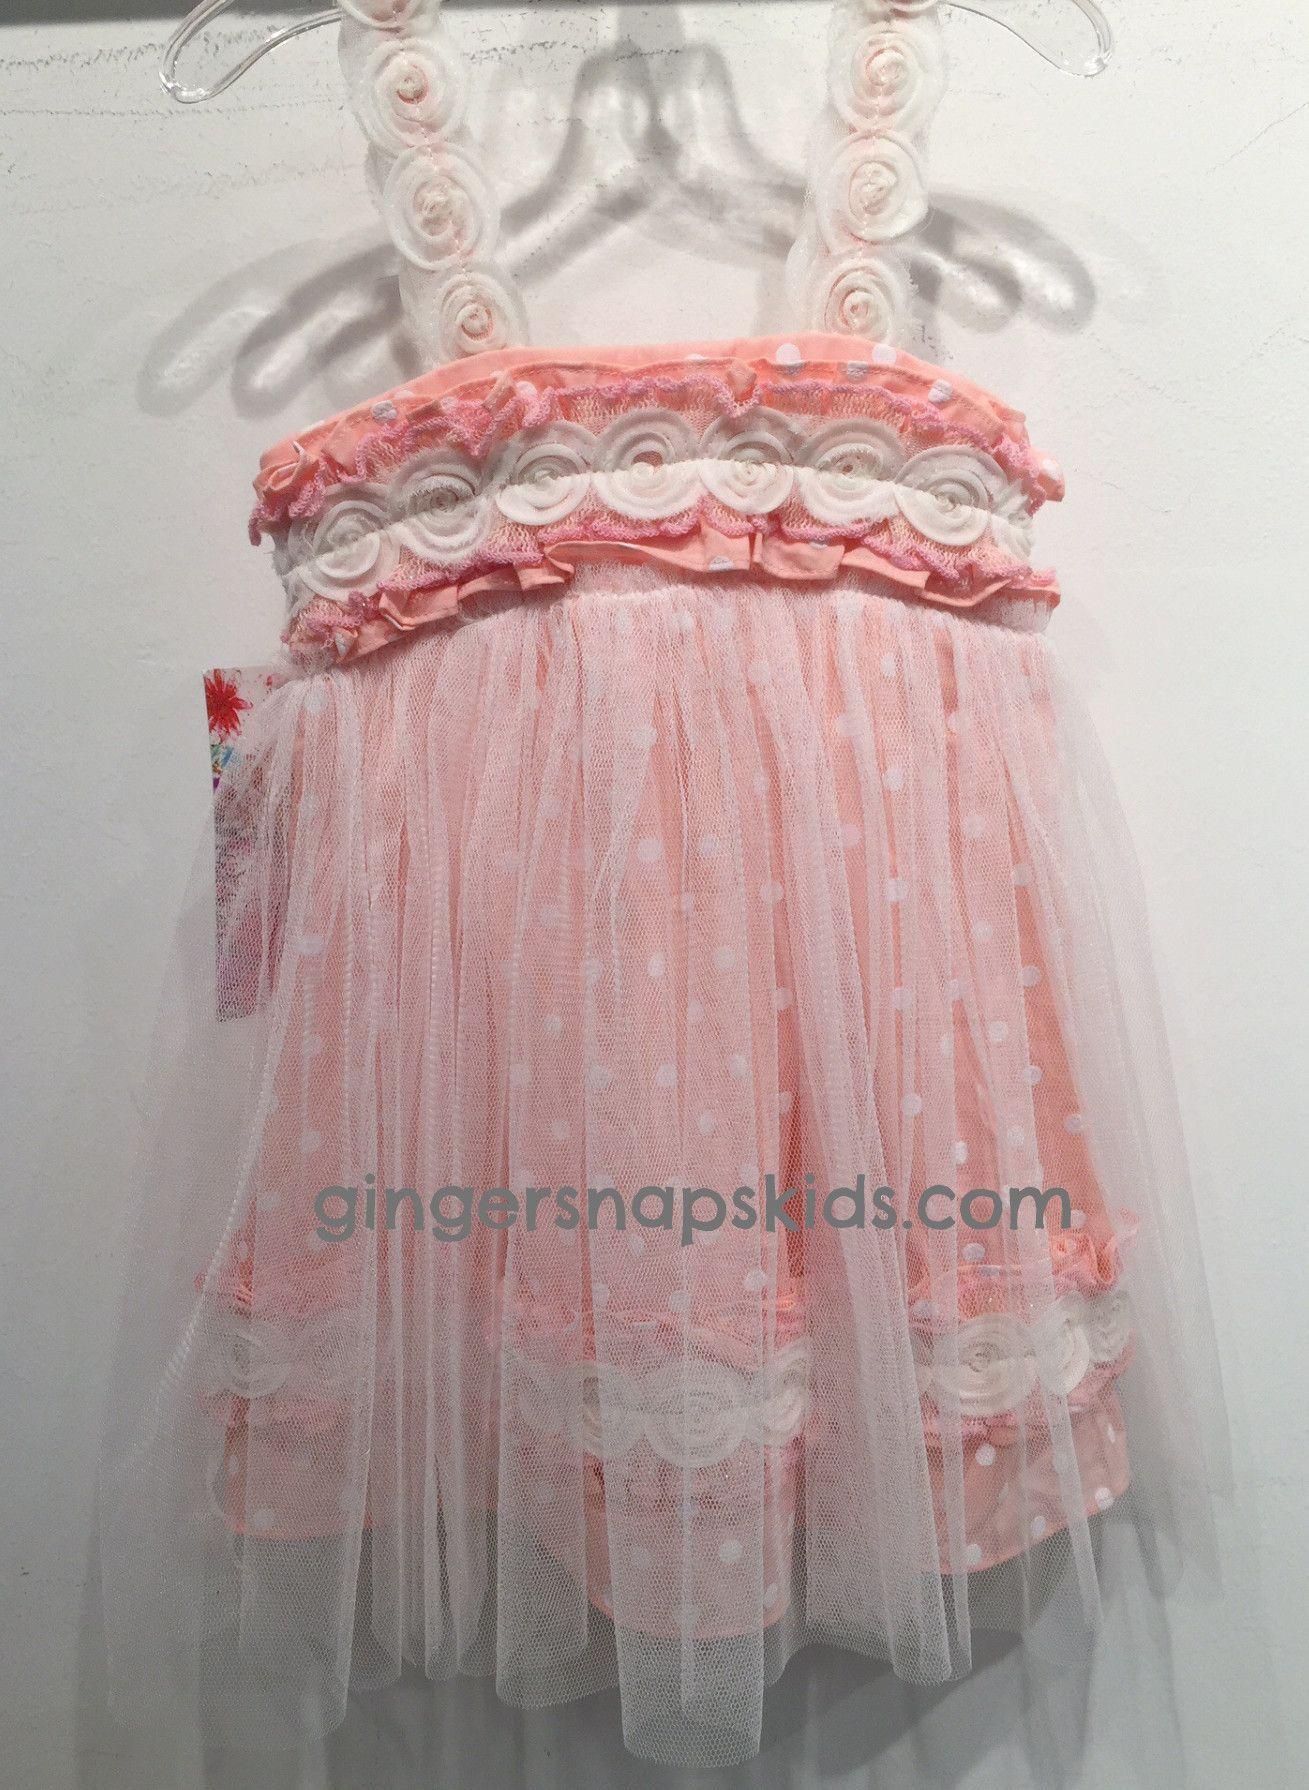 Baby Sara Polka Doodle Polka Dot Dress sz 4T last one